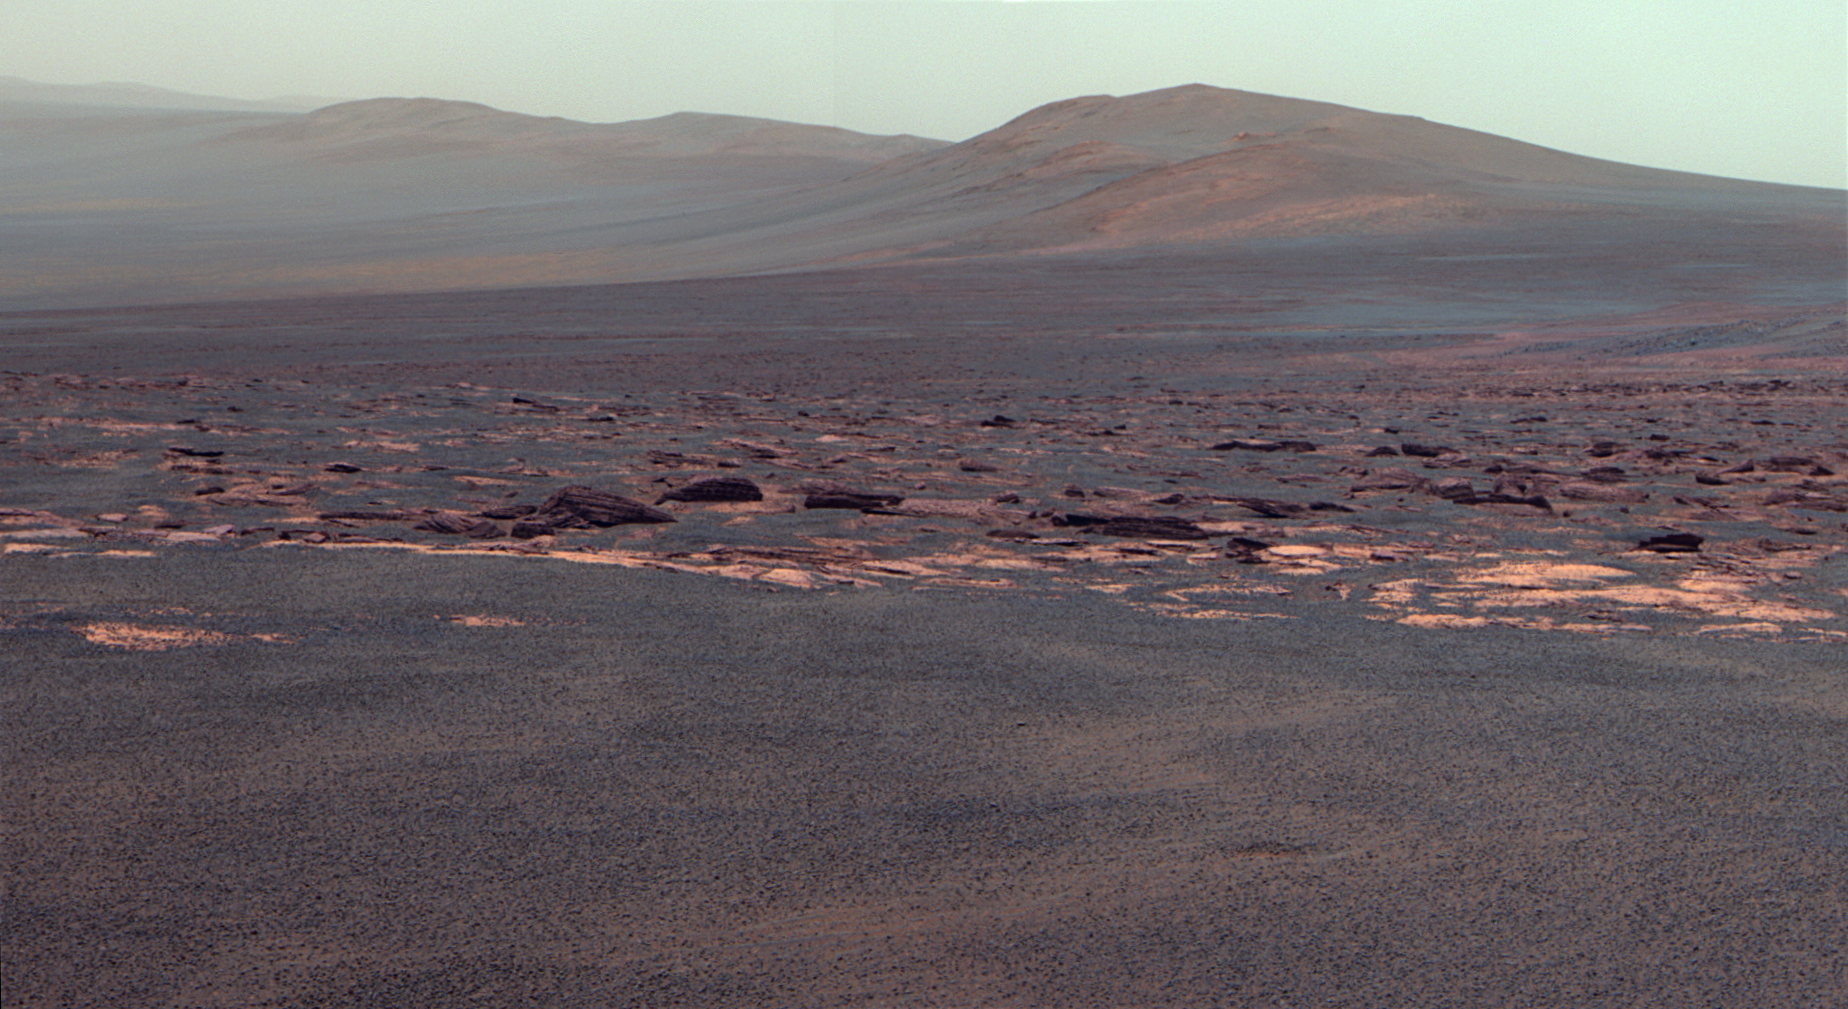 mars rover javascript ironhack - photo #20